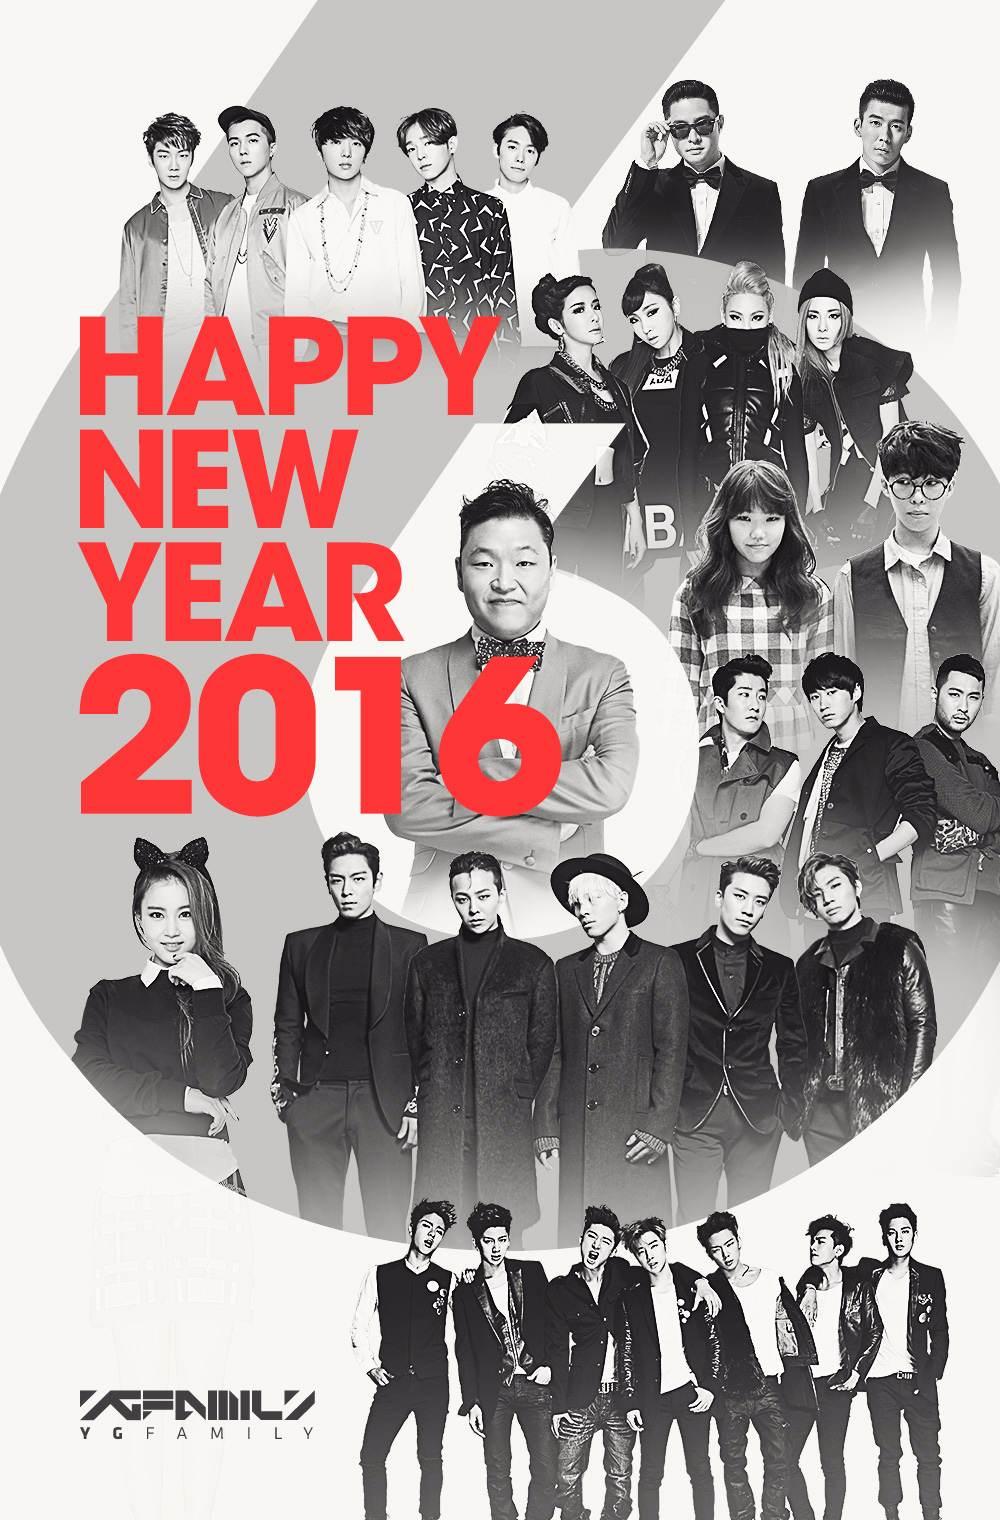 YG娛樂擁有許多獨具特色的歌手,幾乎可以各自SOLO出擊!而YG裡面新生代的團體,就傳出有可能solo出片的消息!